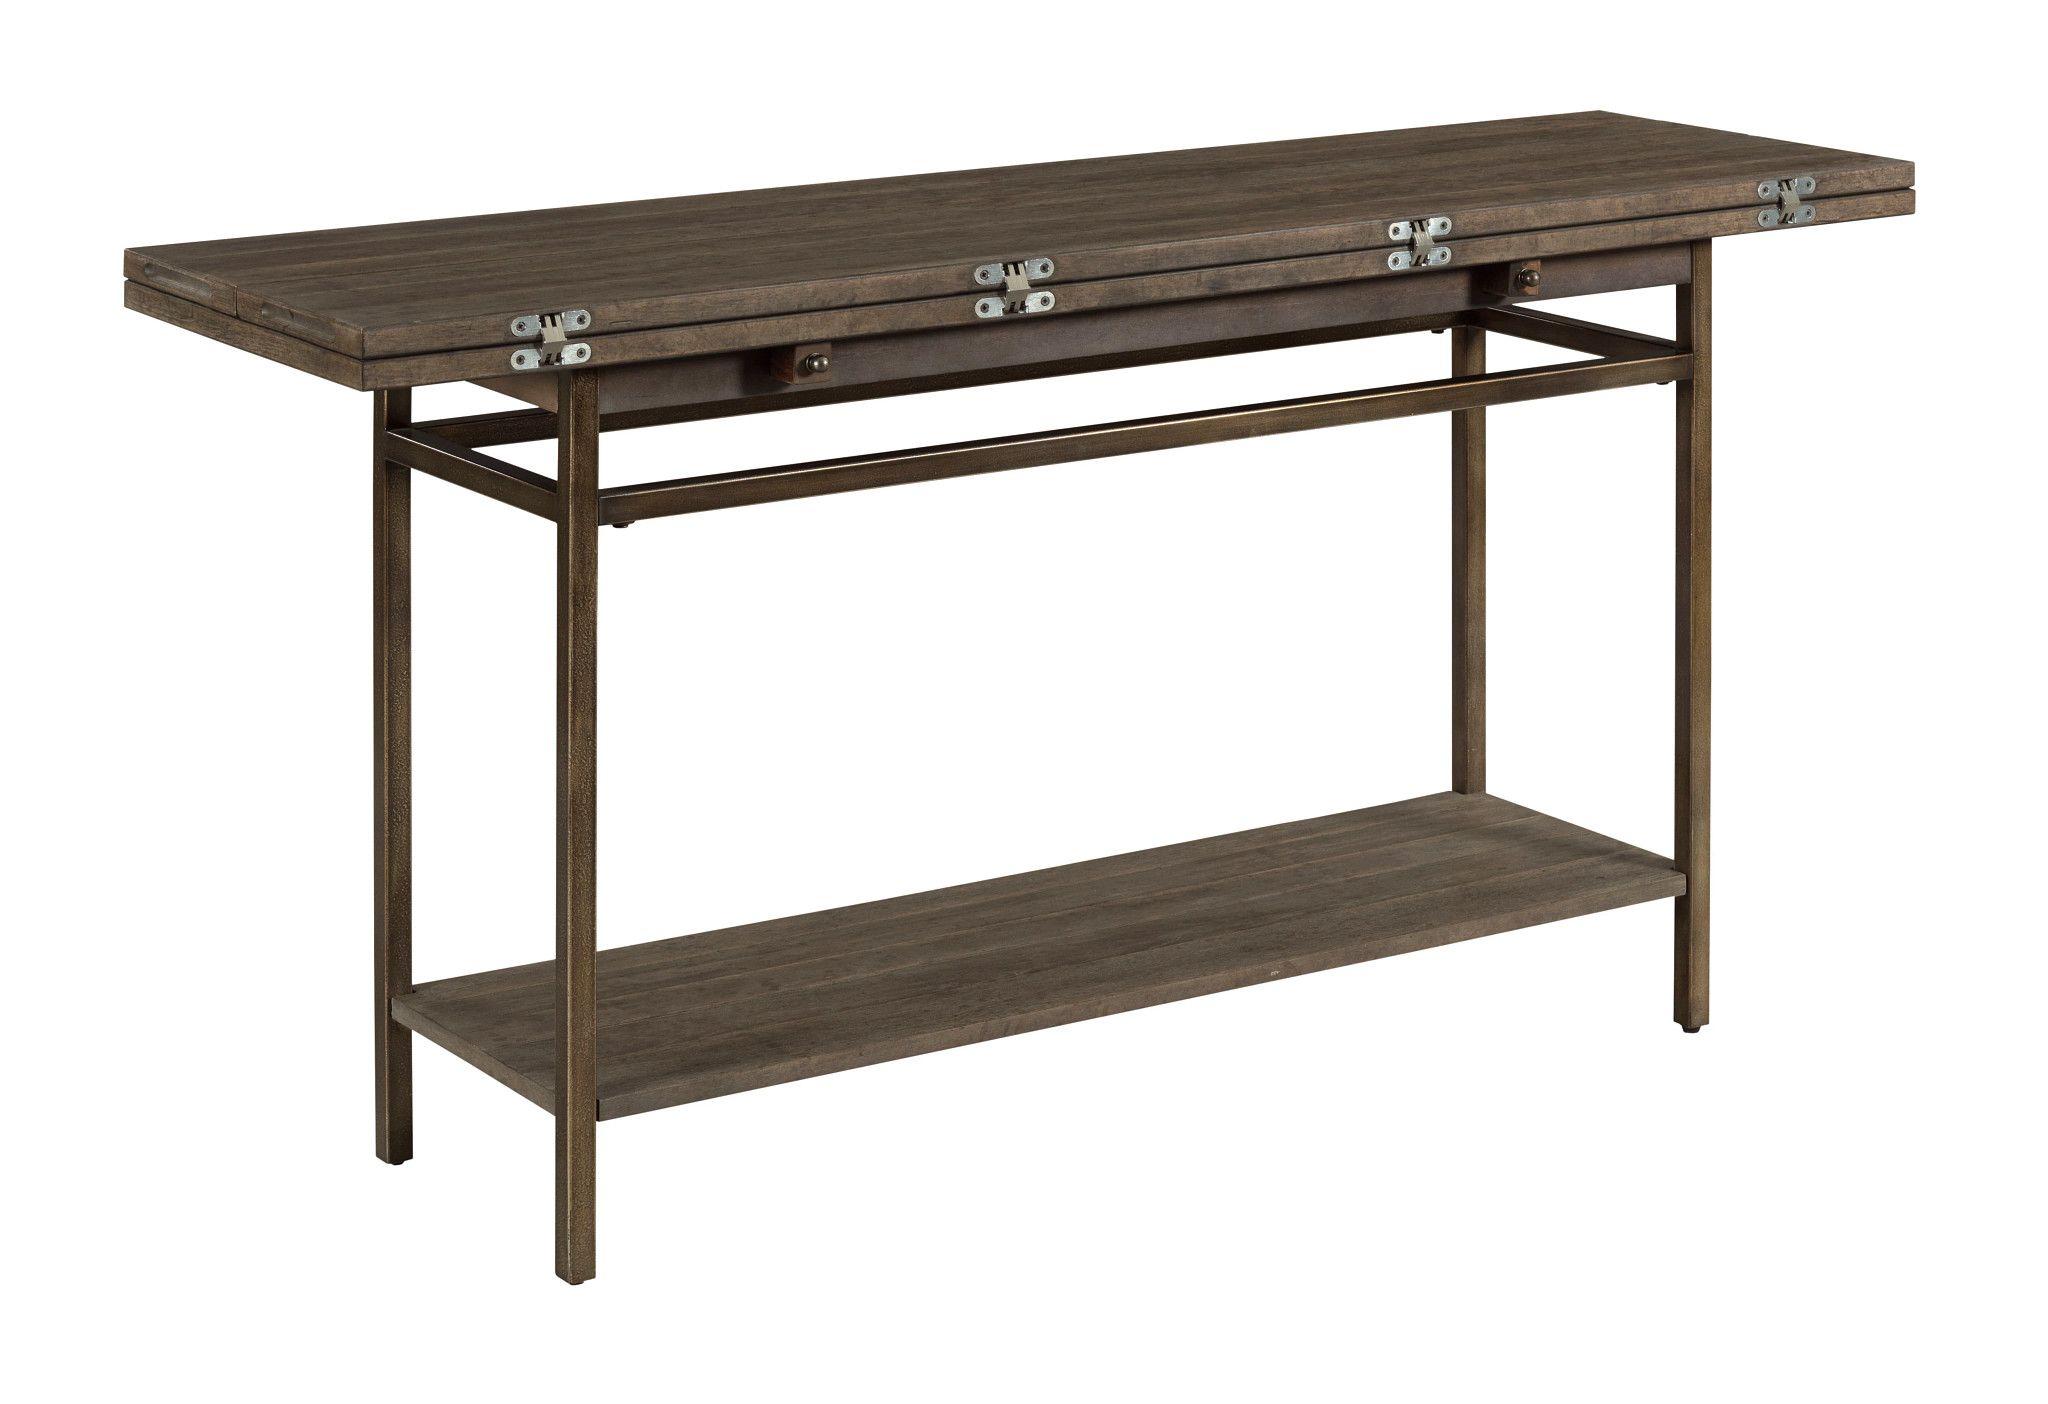 Emporium Sofa Table by American Drew at Mueller Furniture